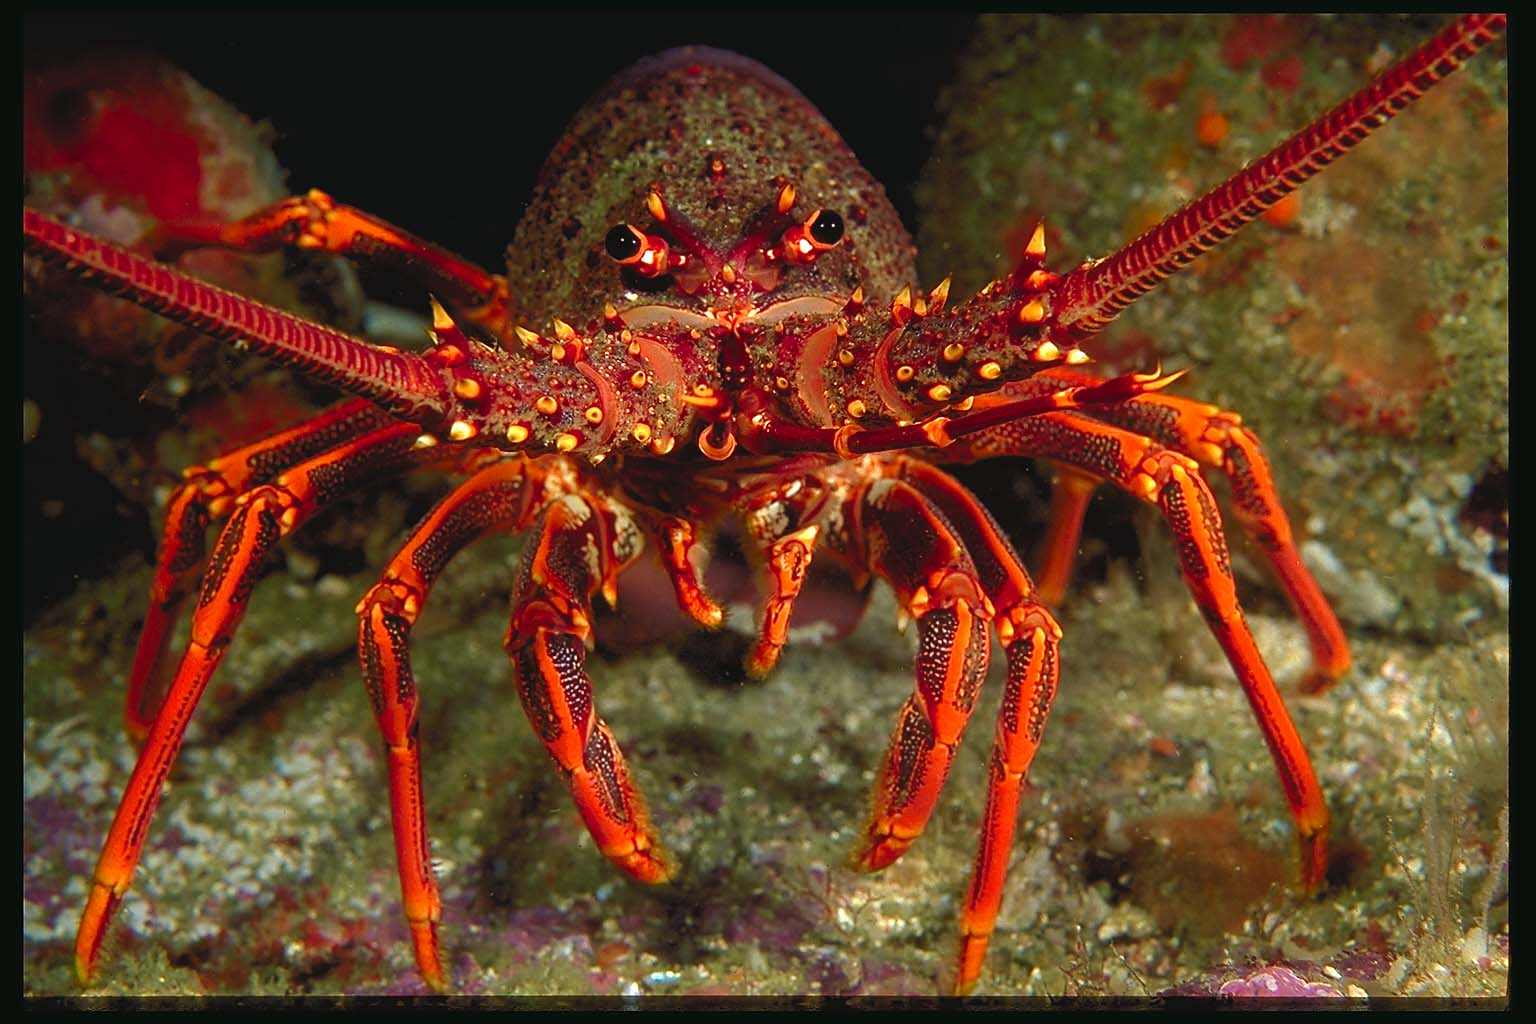 Crayfish Pictures